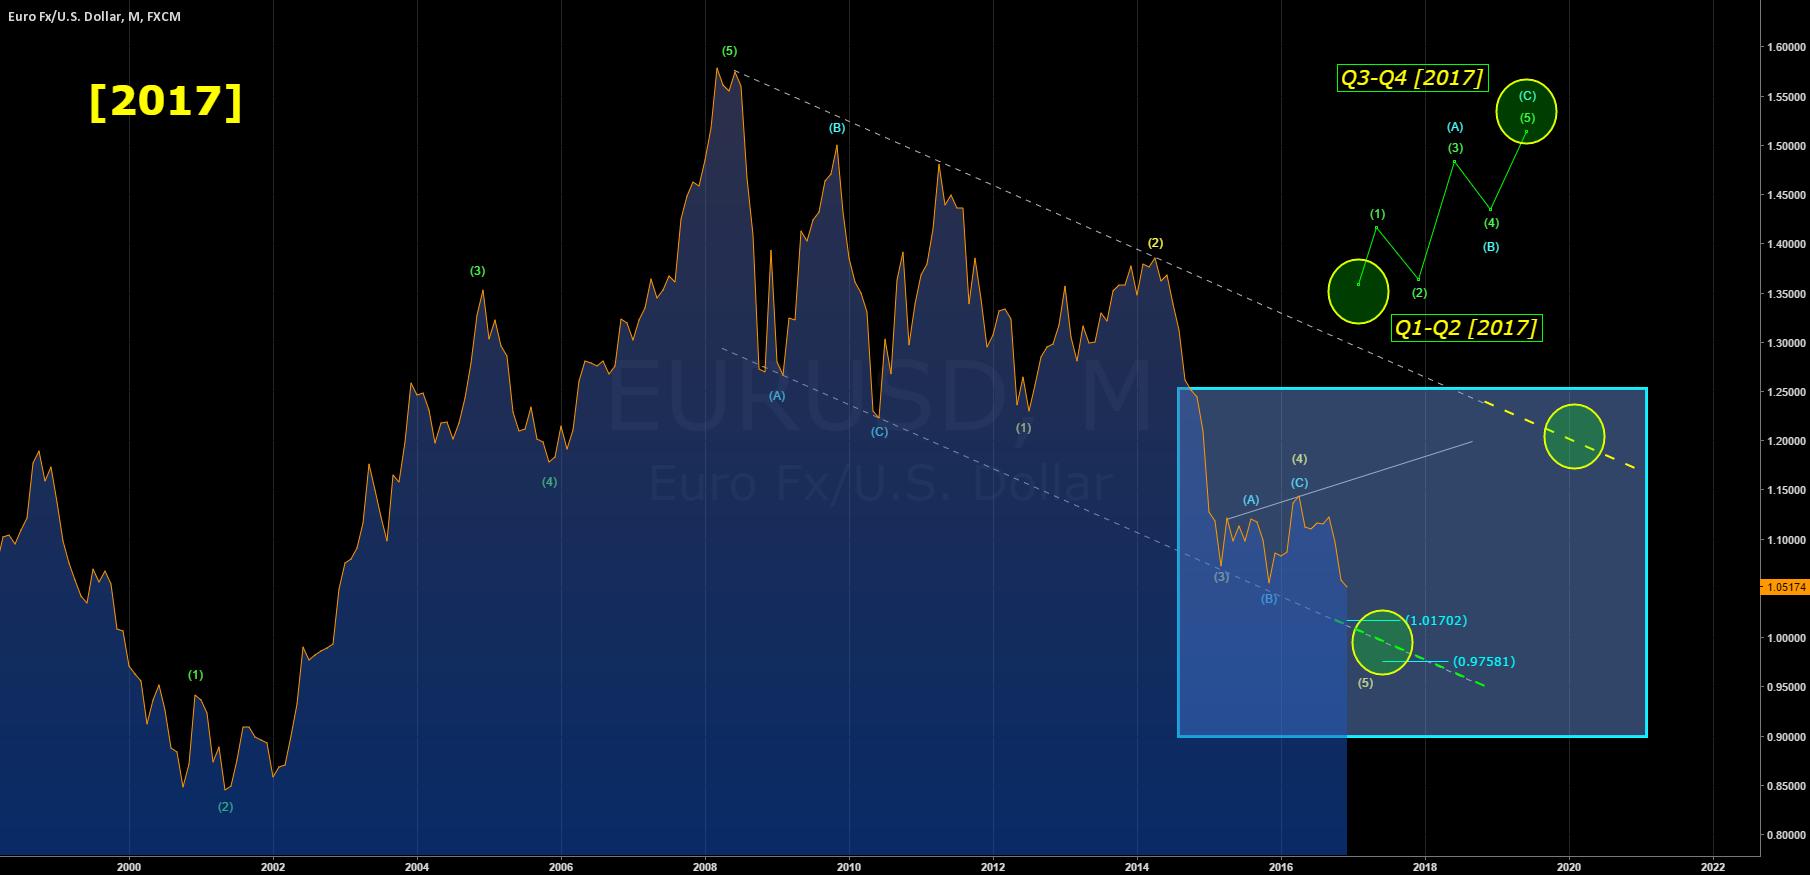 [EURUSD] 2017 - Medium term Analysis